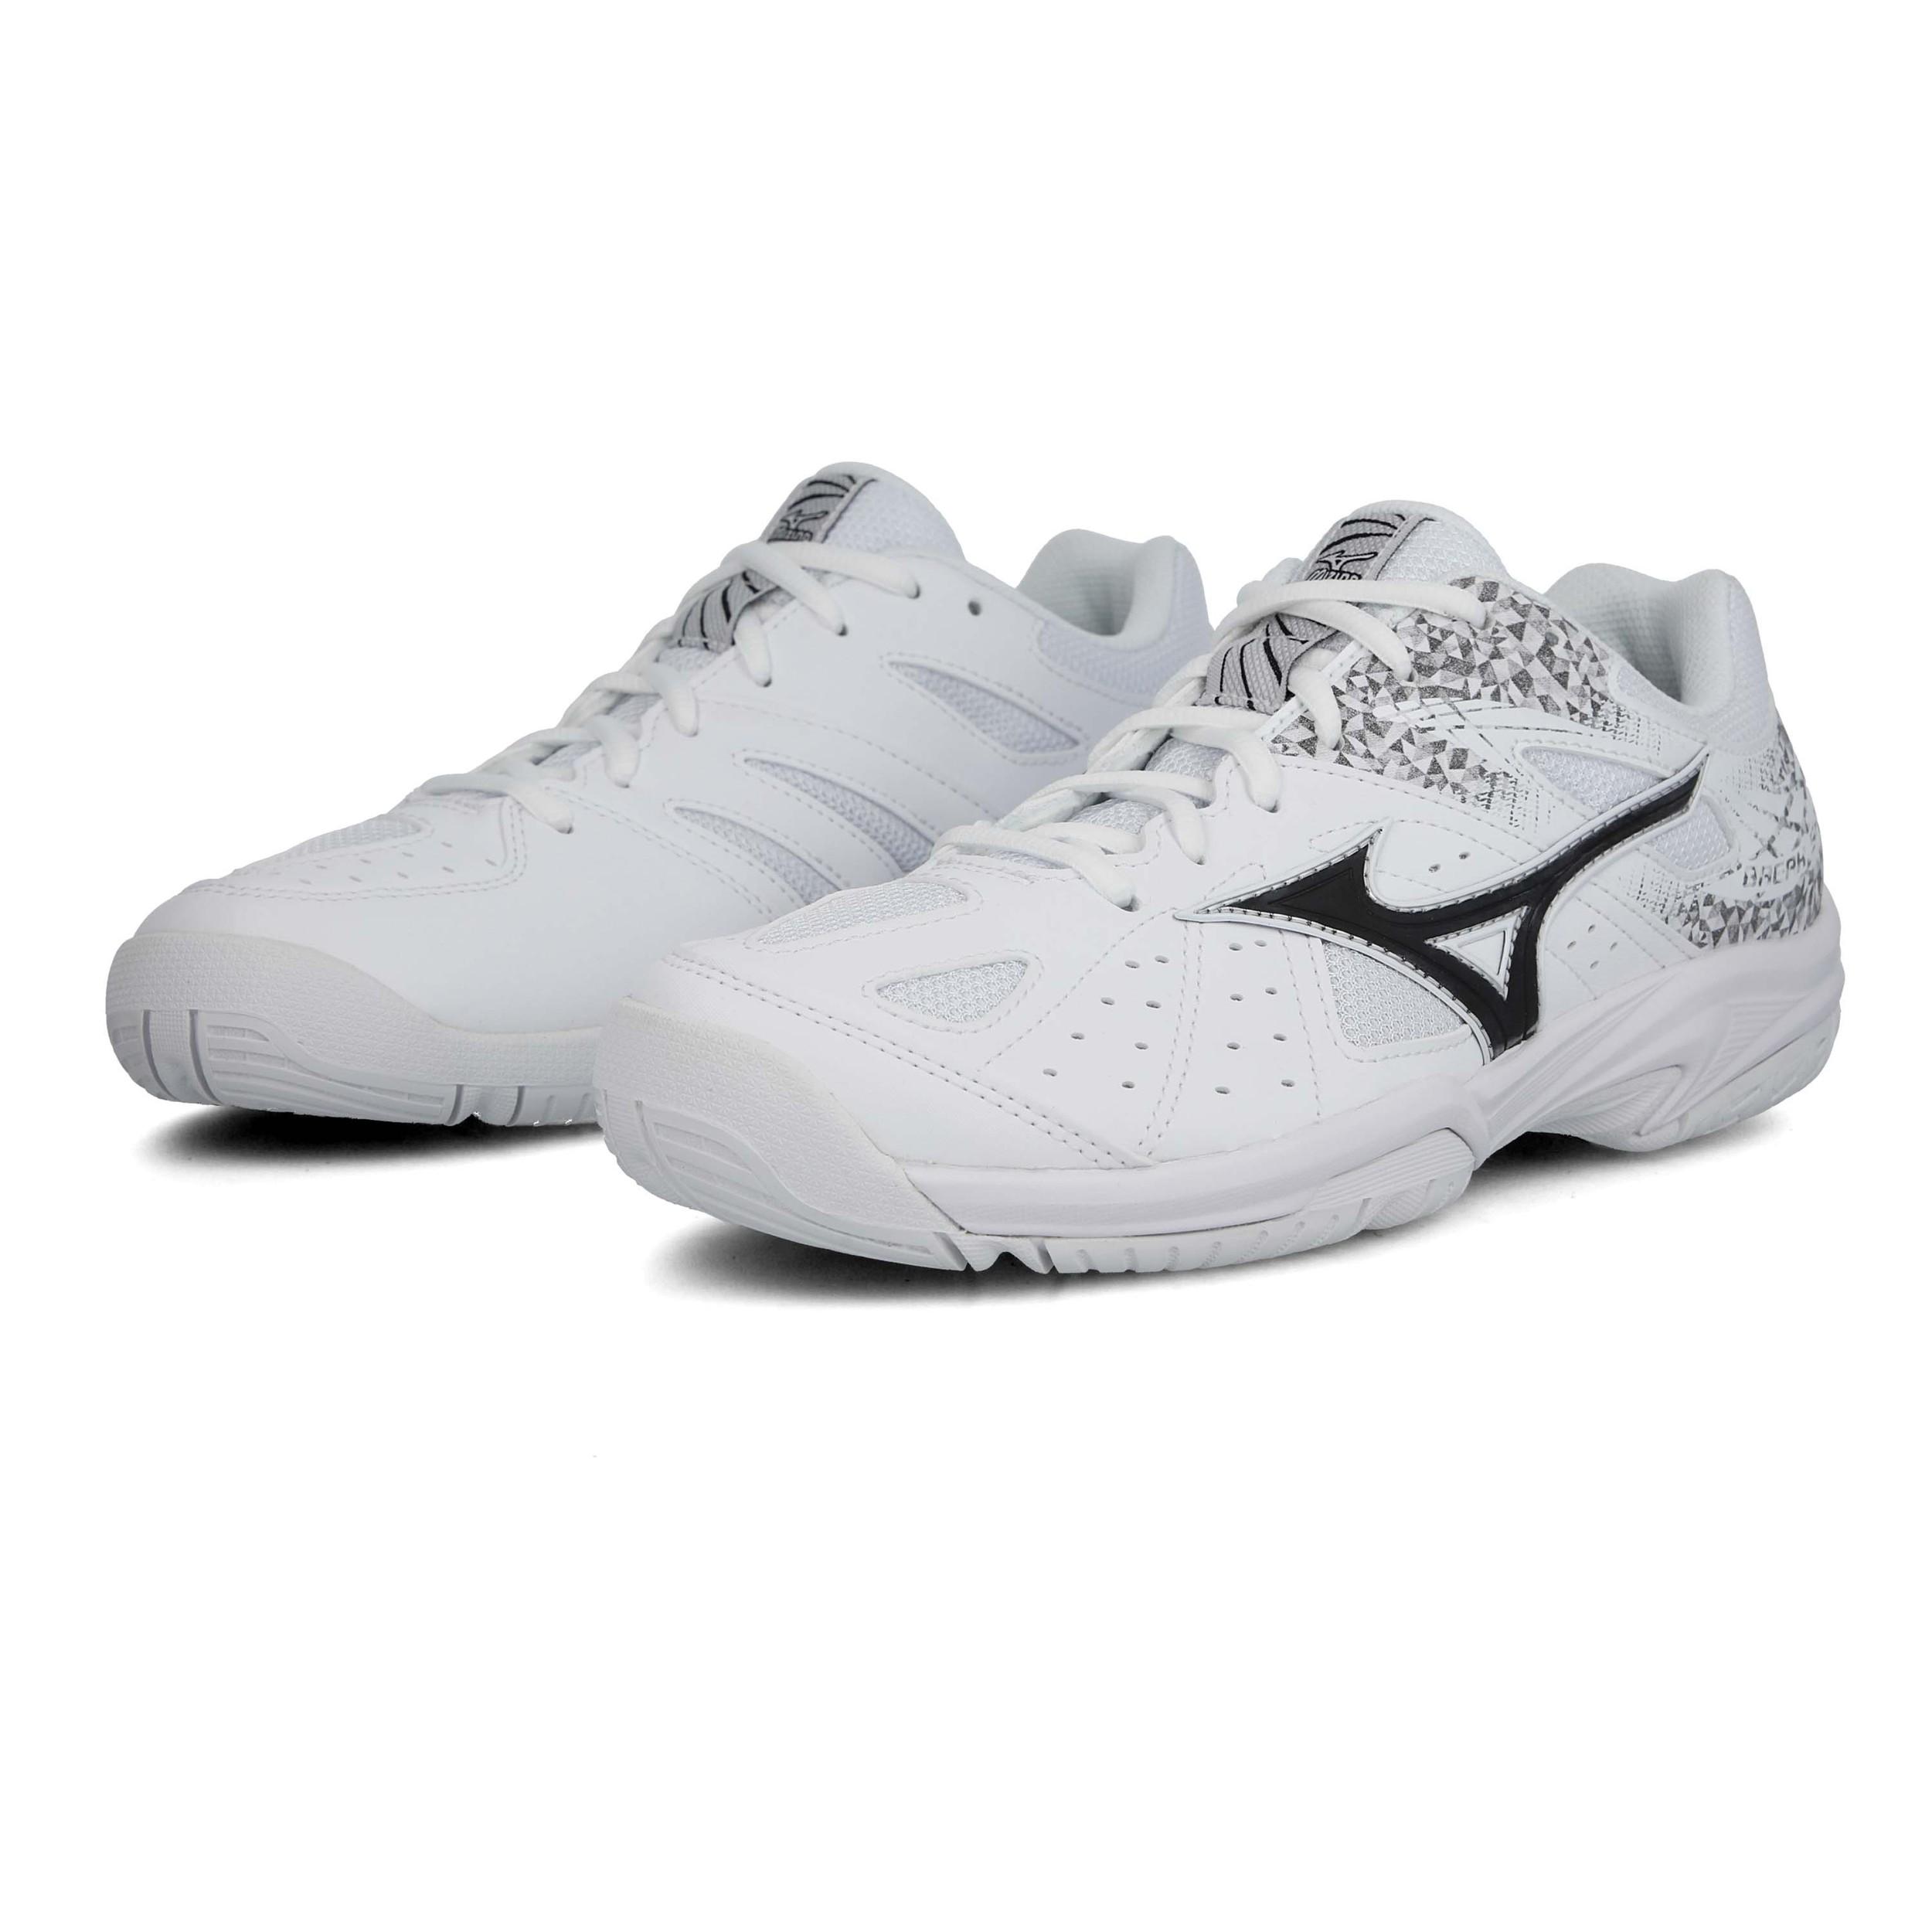 Mizuno Break Shot 2 AC Tennis Shoes - AW20